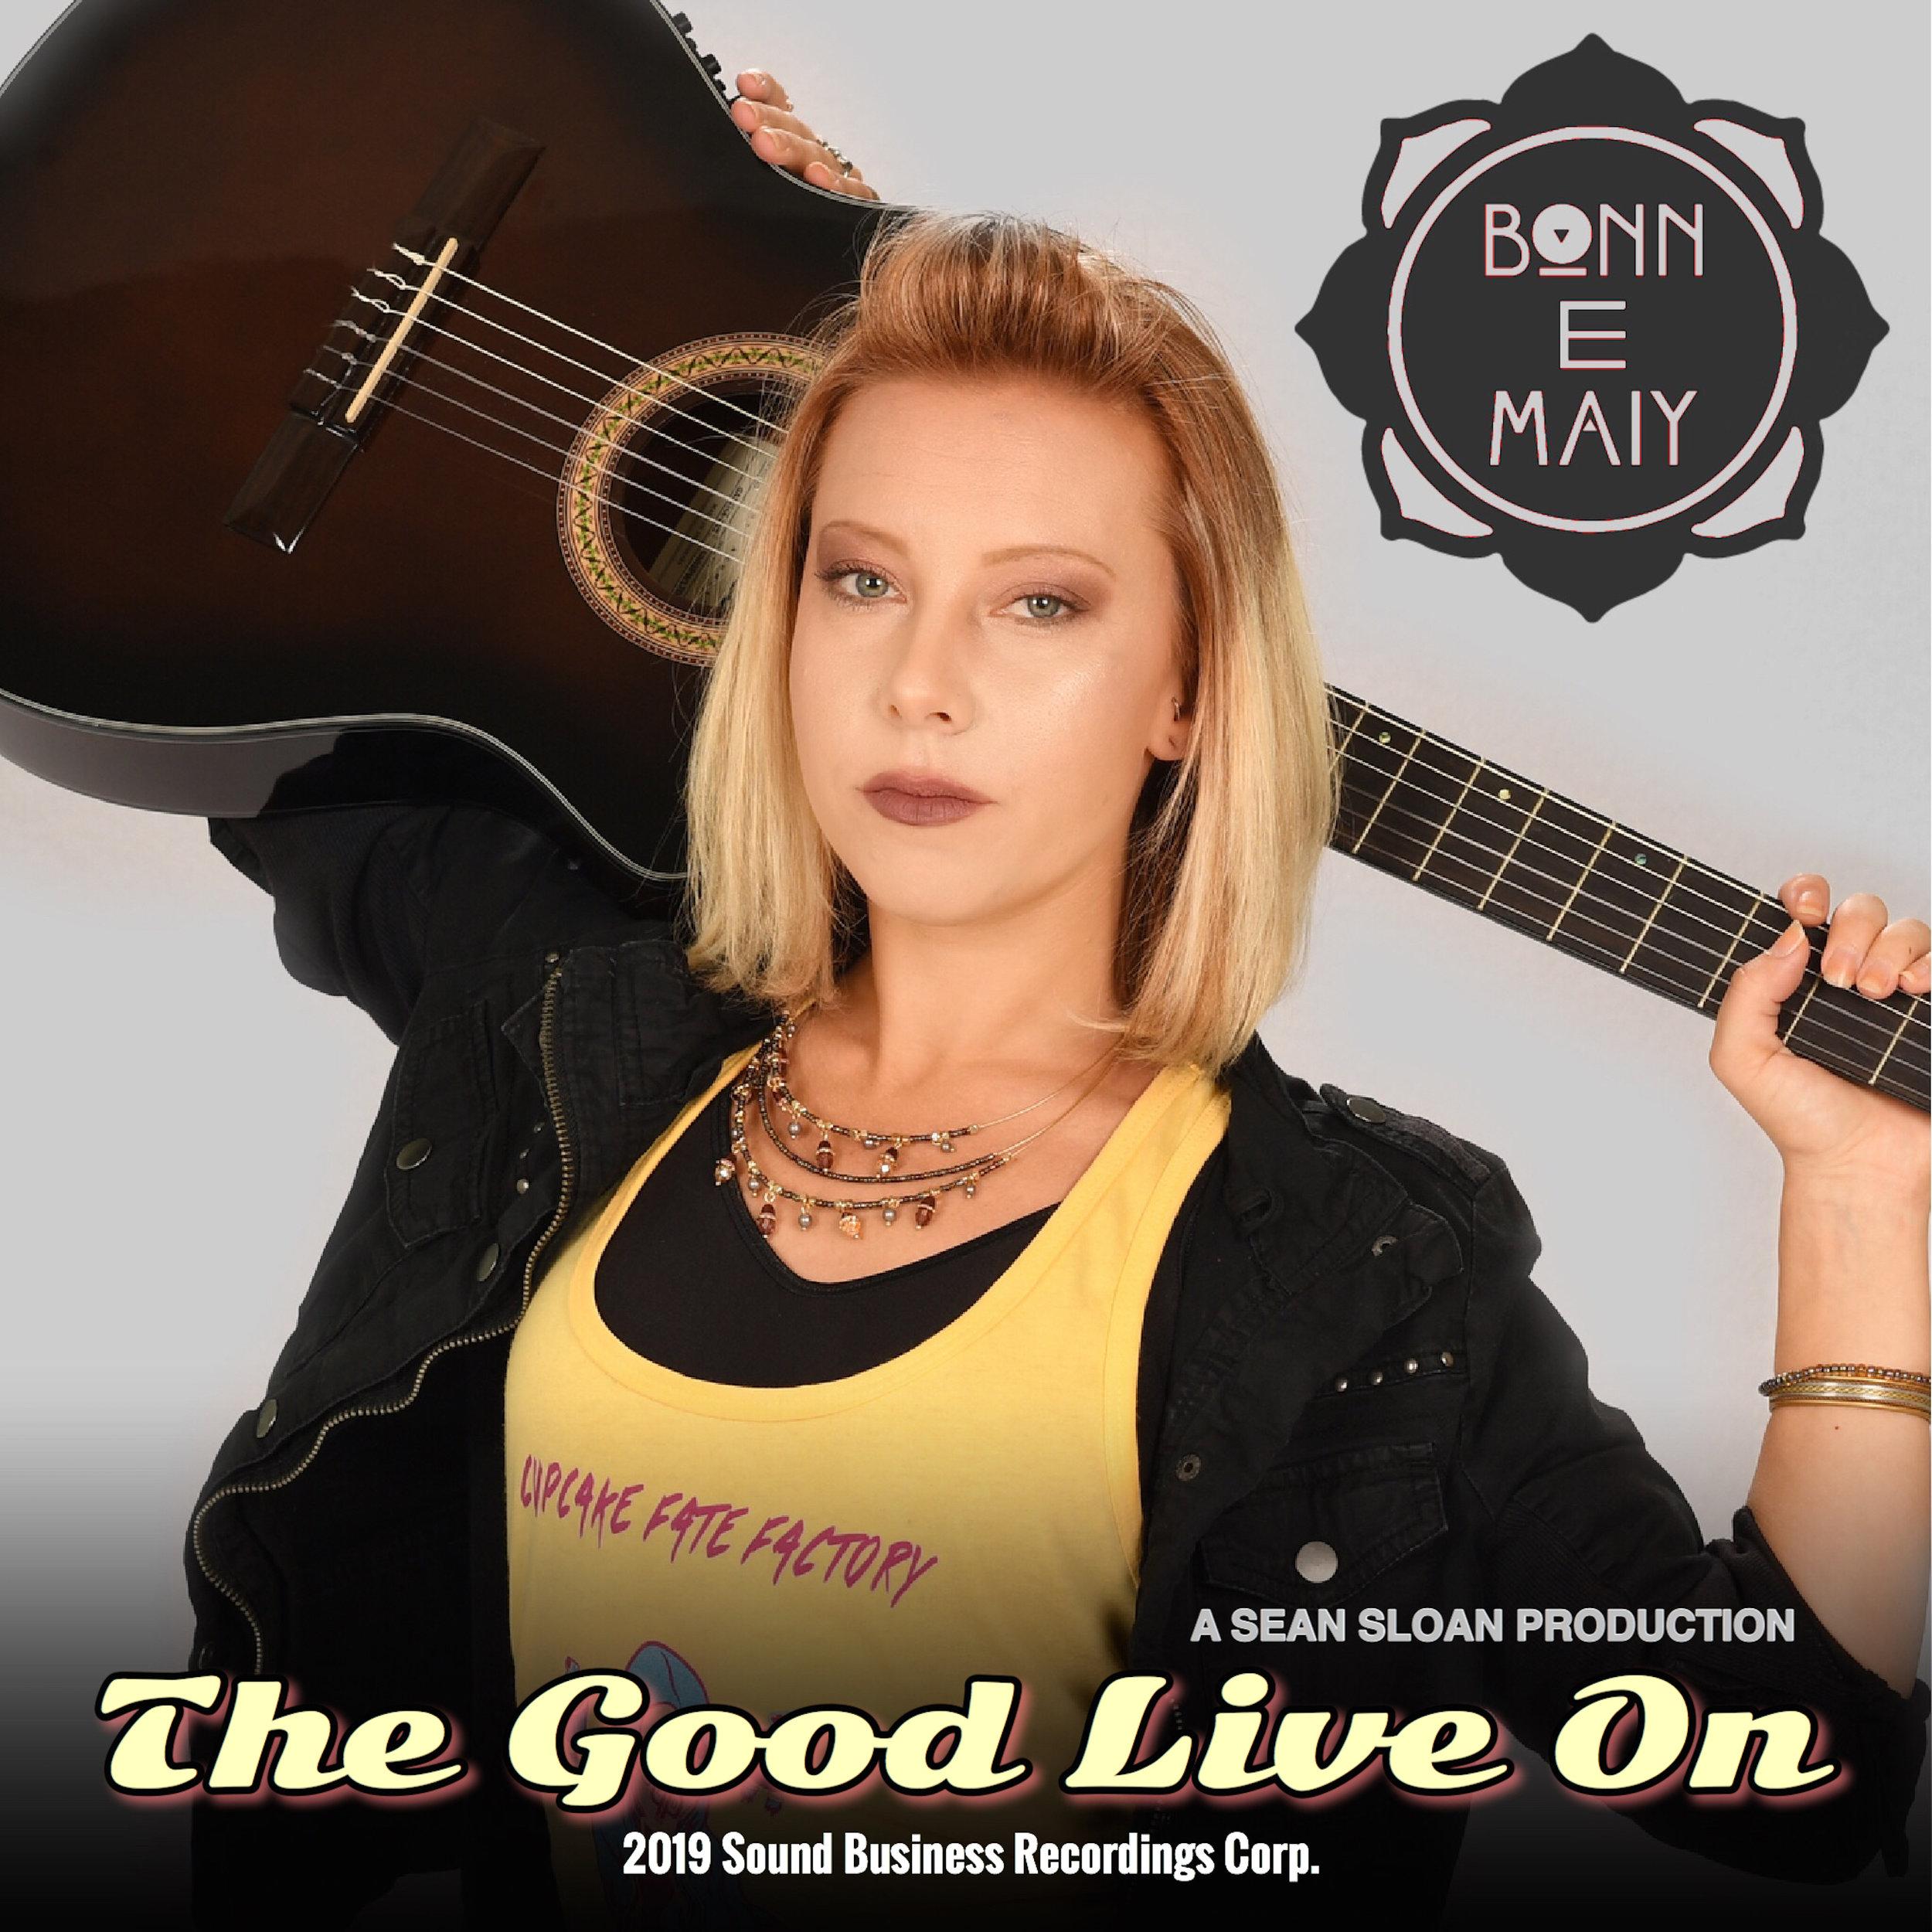 BEM - The Good Live On - Main Thumbnail.JPG